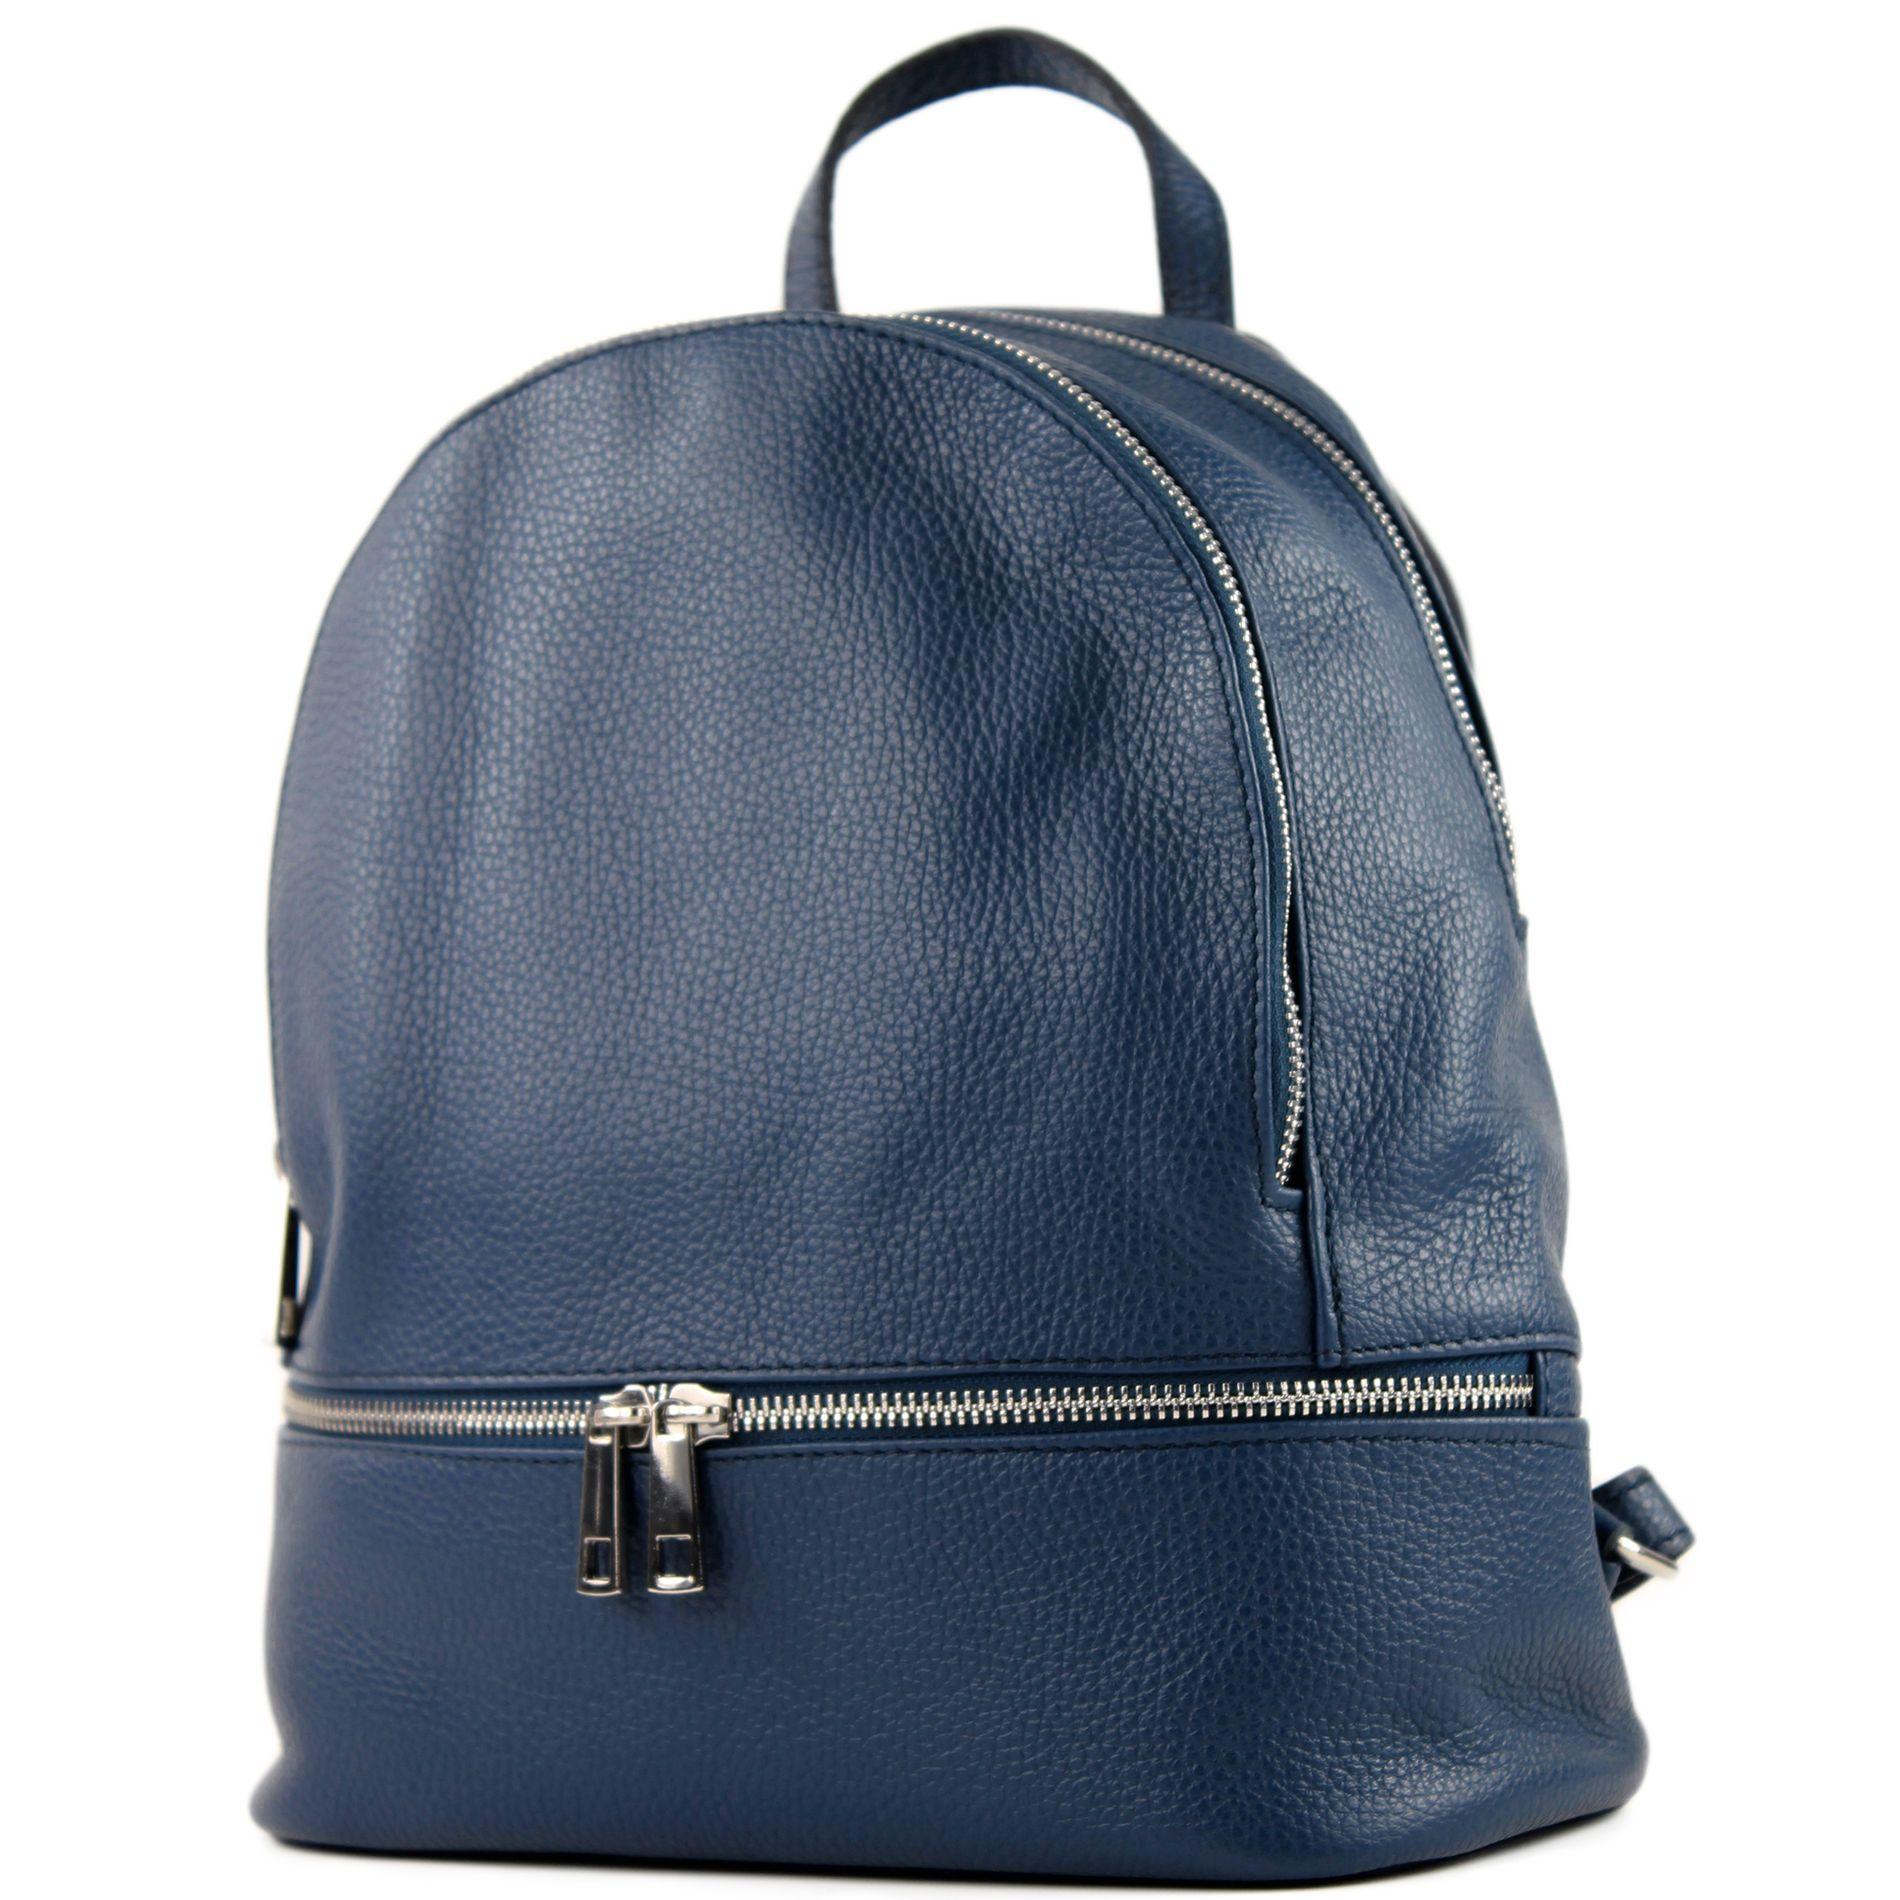 ganz nett Verkaufsförderung süß modamoda de - T137 Leder - ital Damen Rucksack Leder oder Nappaleder